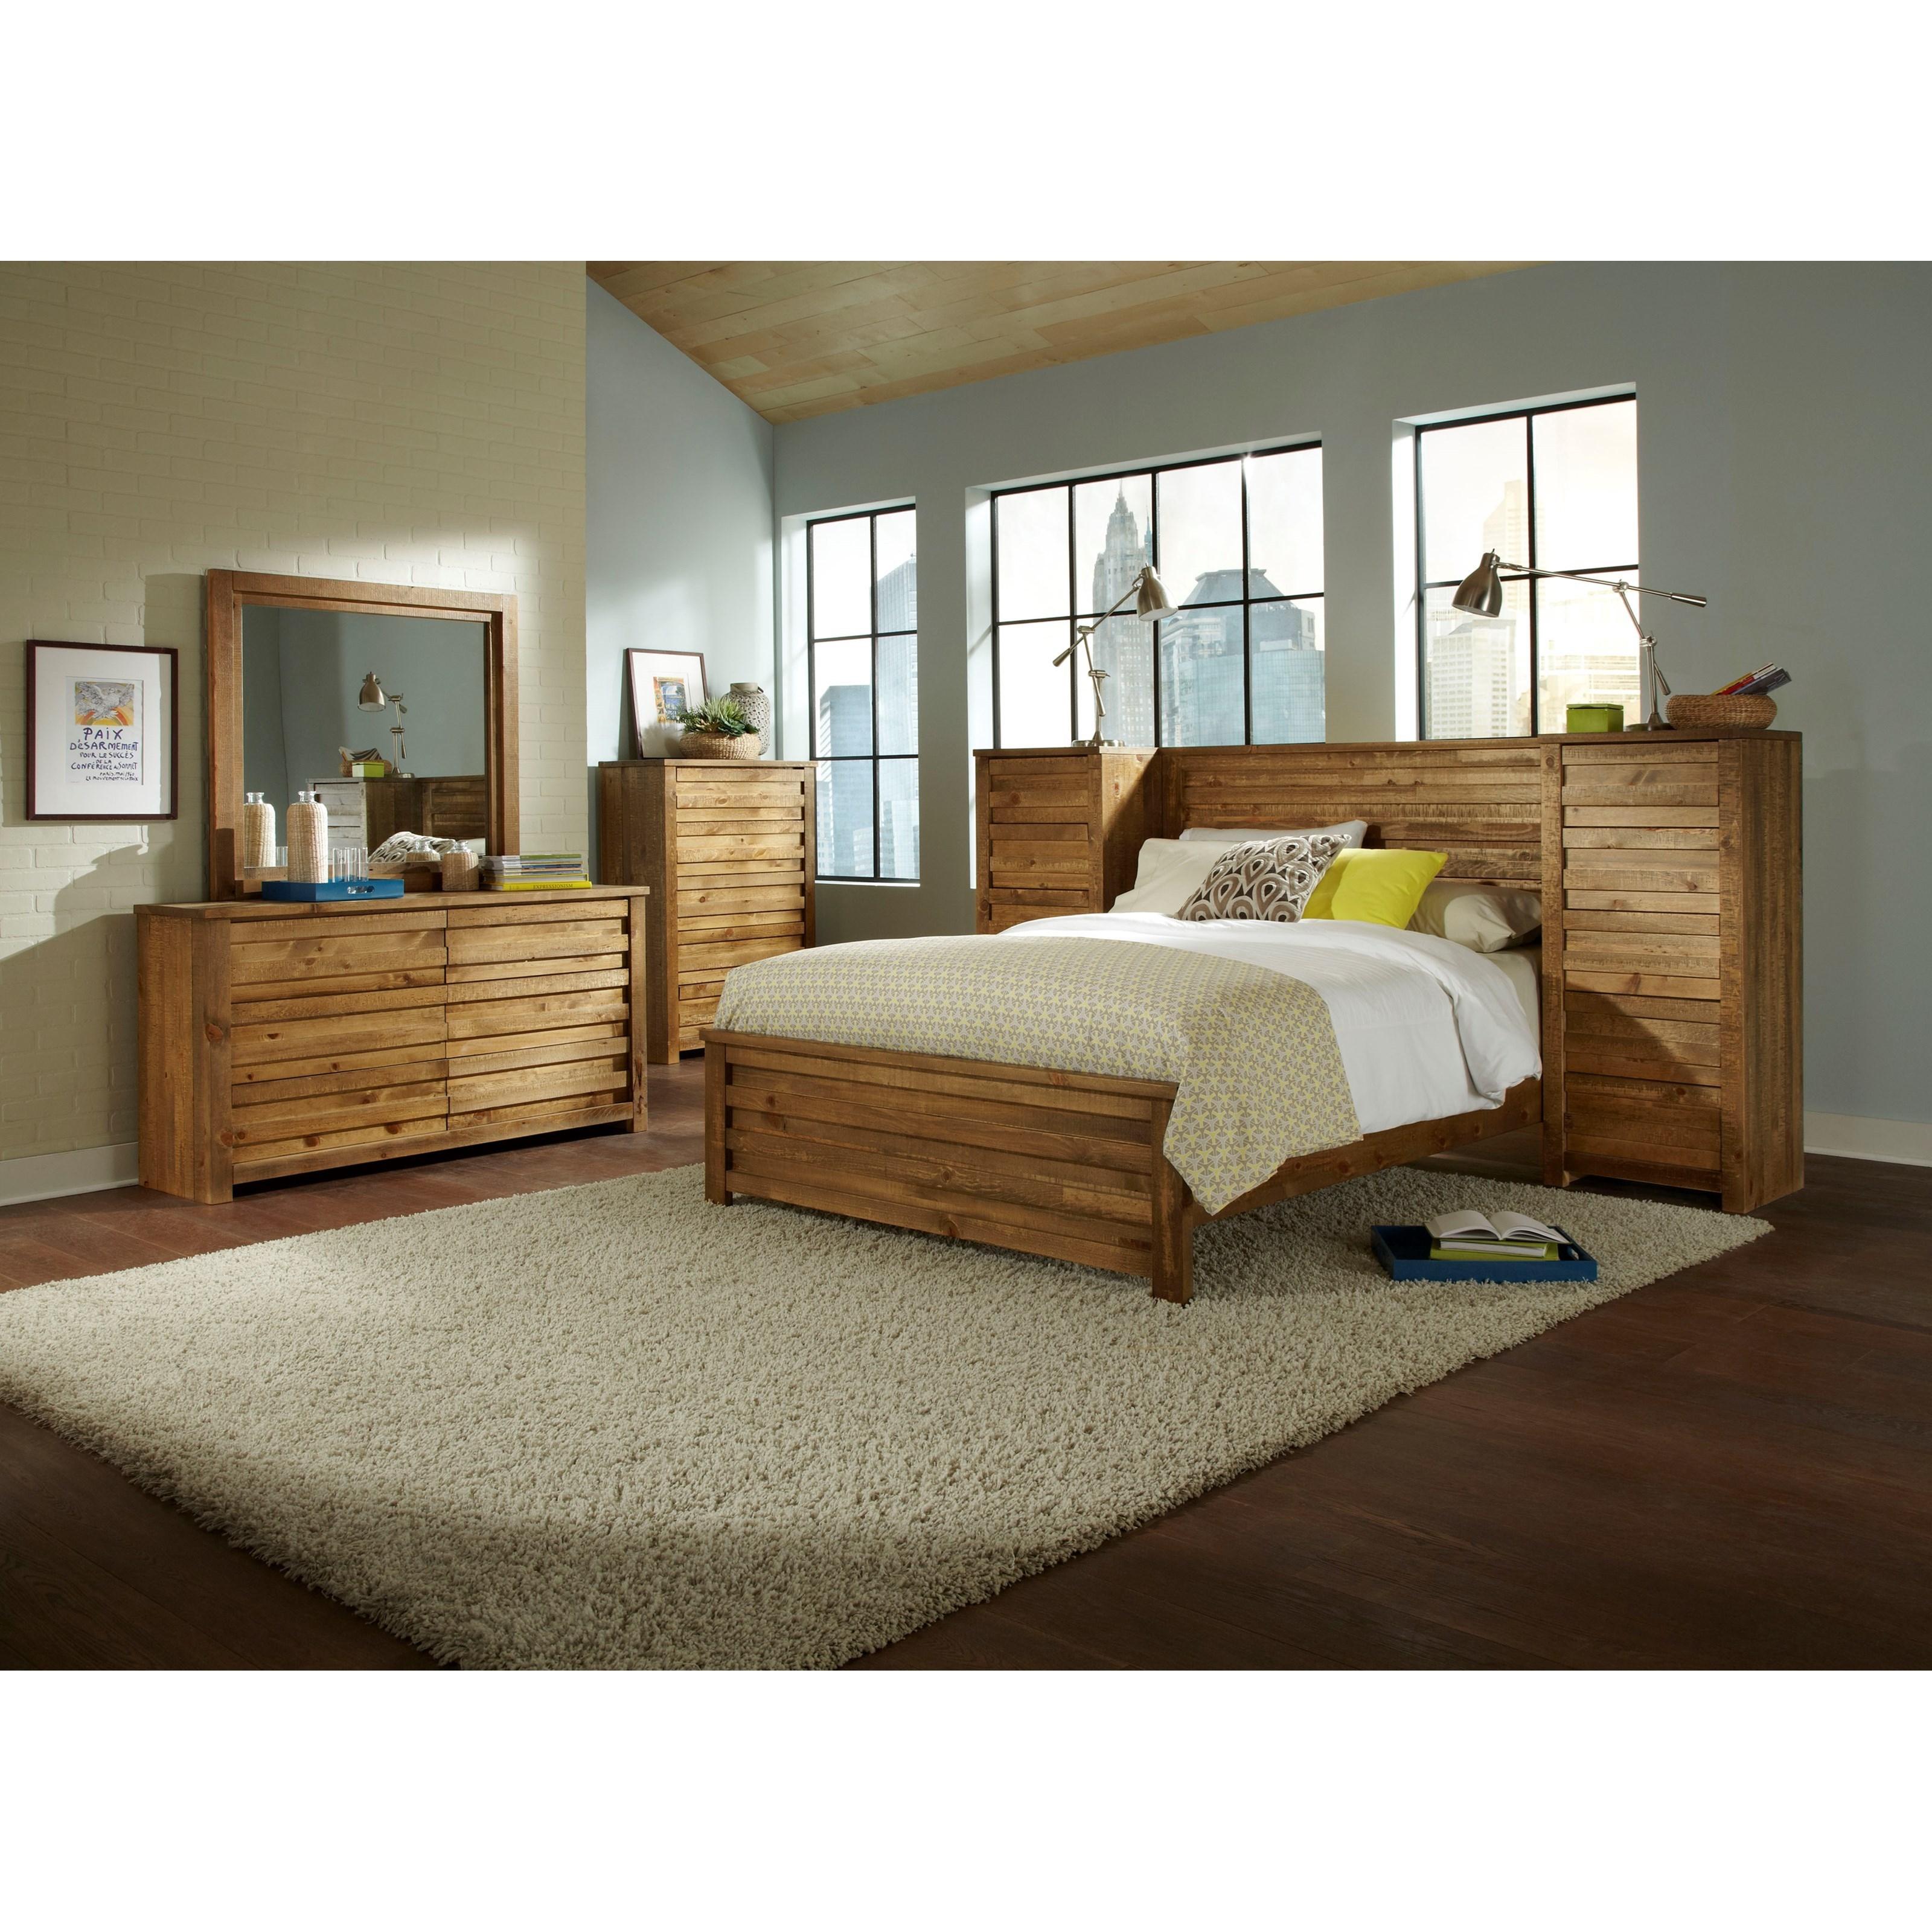 Progressive Furniture P604-13 Lingerie Chest Driftwood NEW